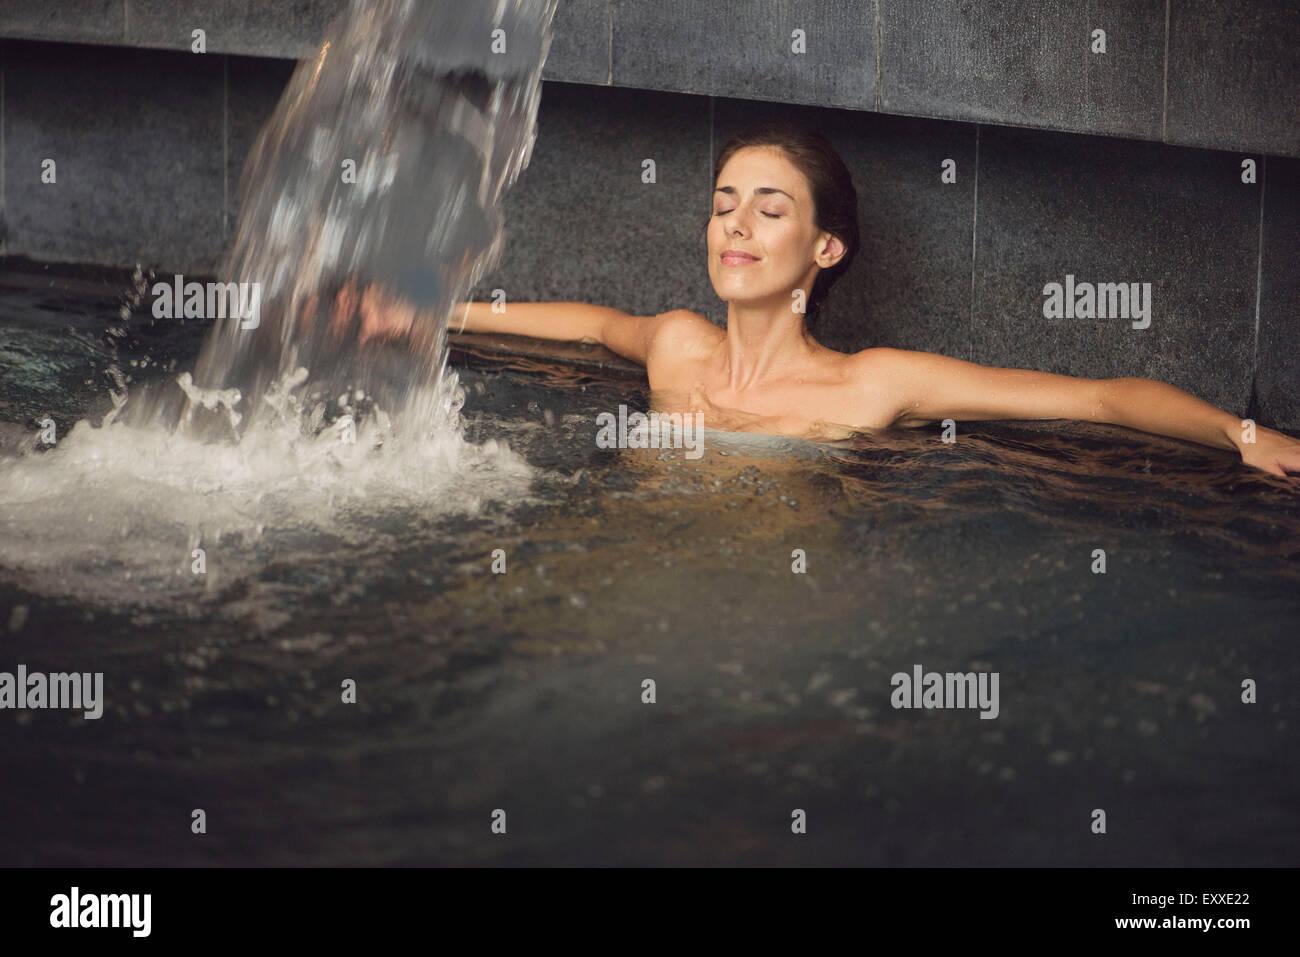 Femme baignant dans la piscine spa Photo Stock